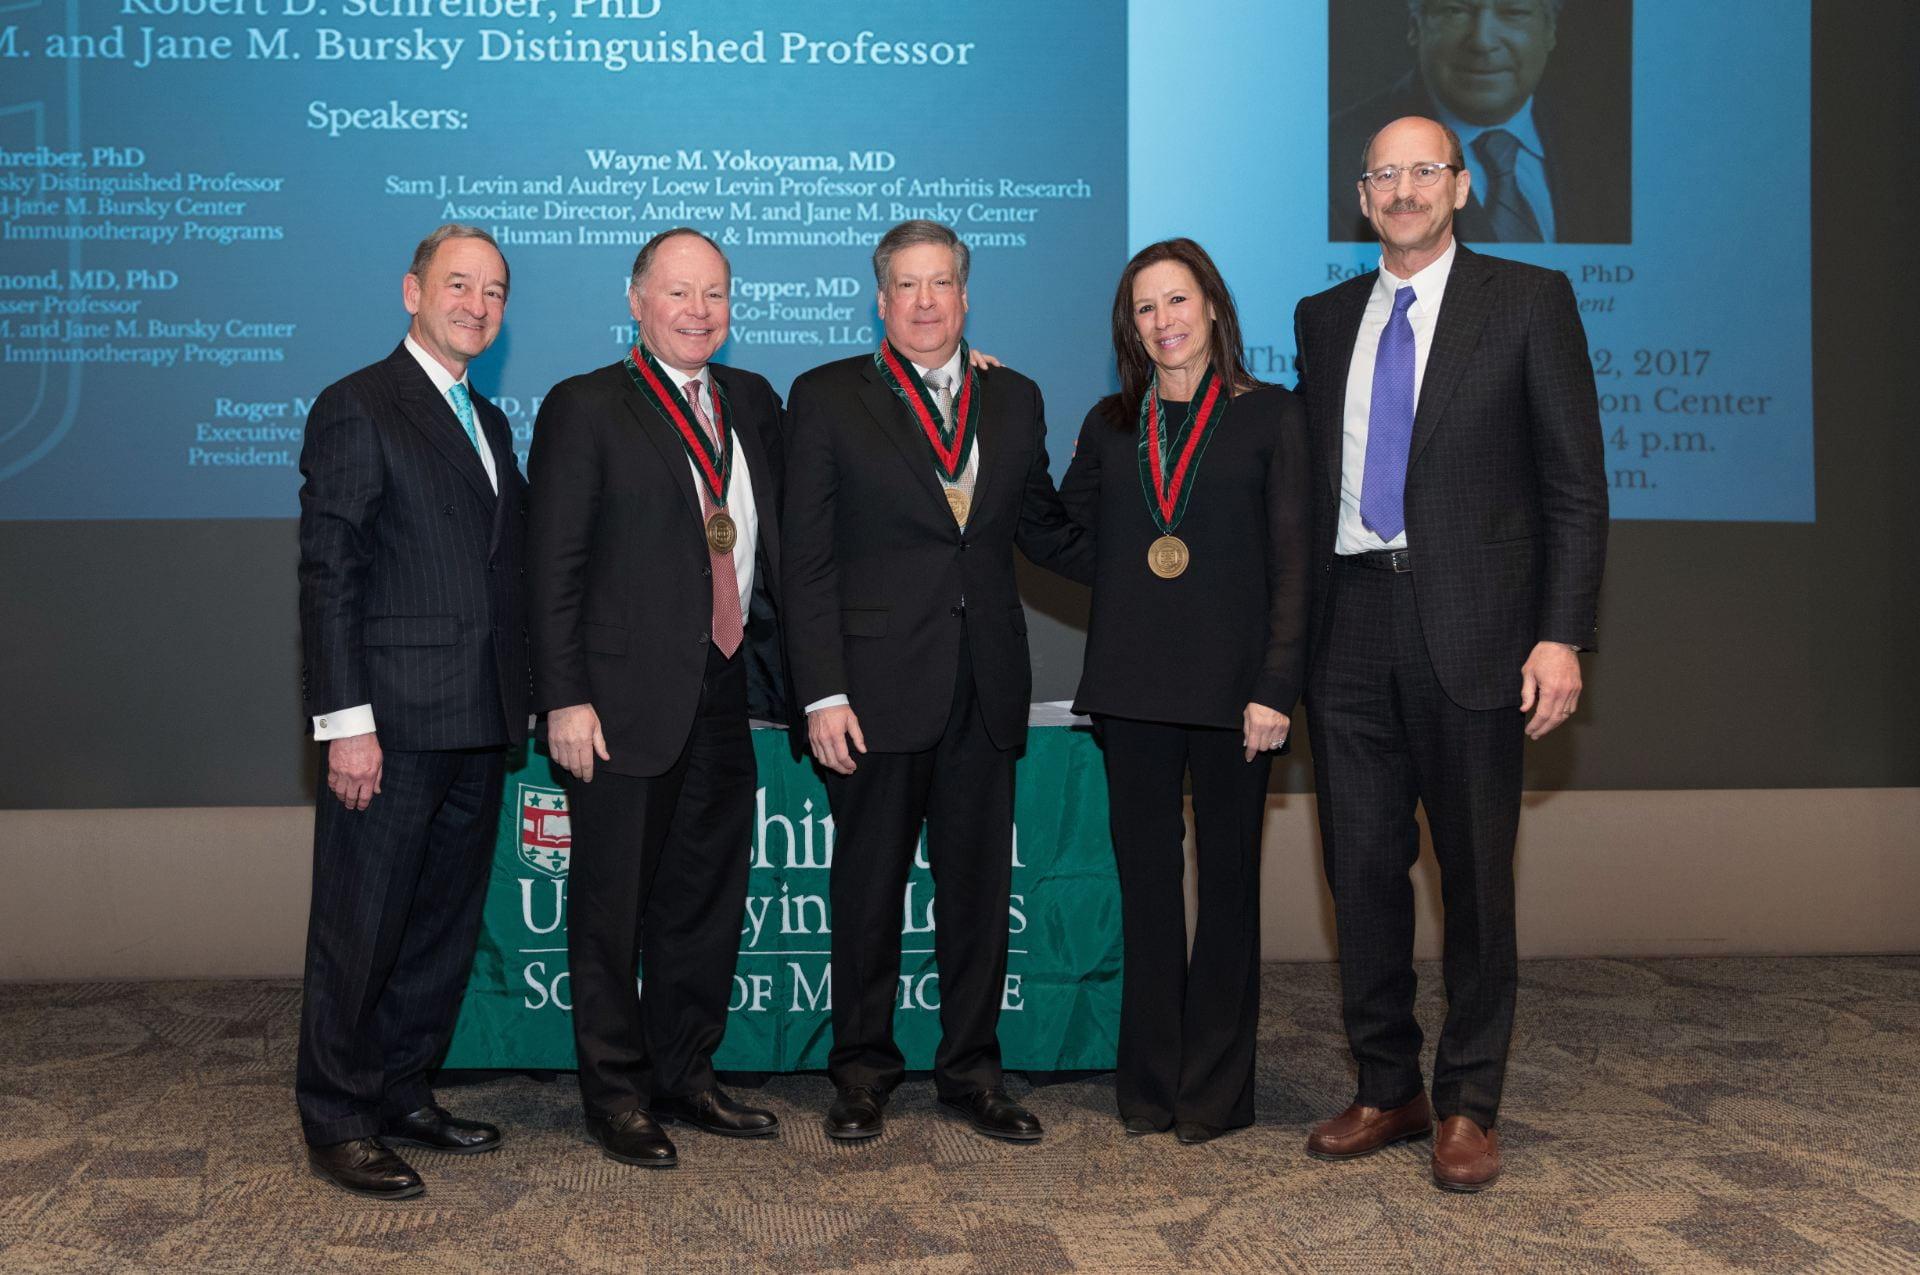 Chancellor Wrighton, Andy Bursky, Bob Schreiber, Jane Bursky, Dean Perlmutter